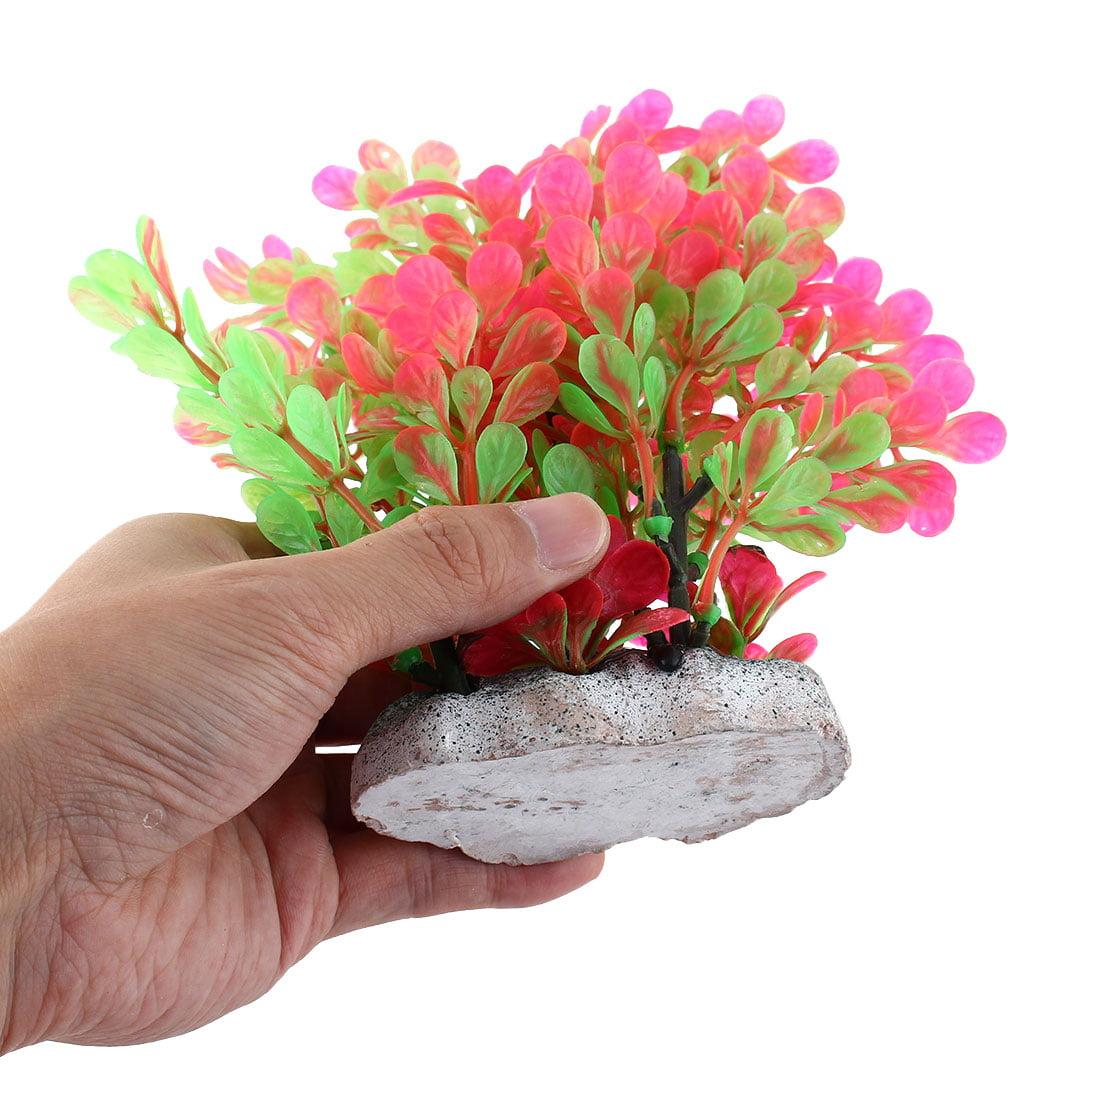 Aquarium Artificial Plant Adornment Landscape Manmade Water Ornament Green Pink - image 2 de 3